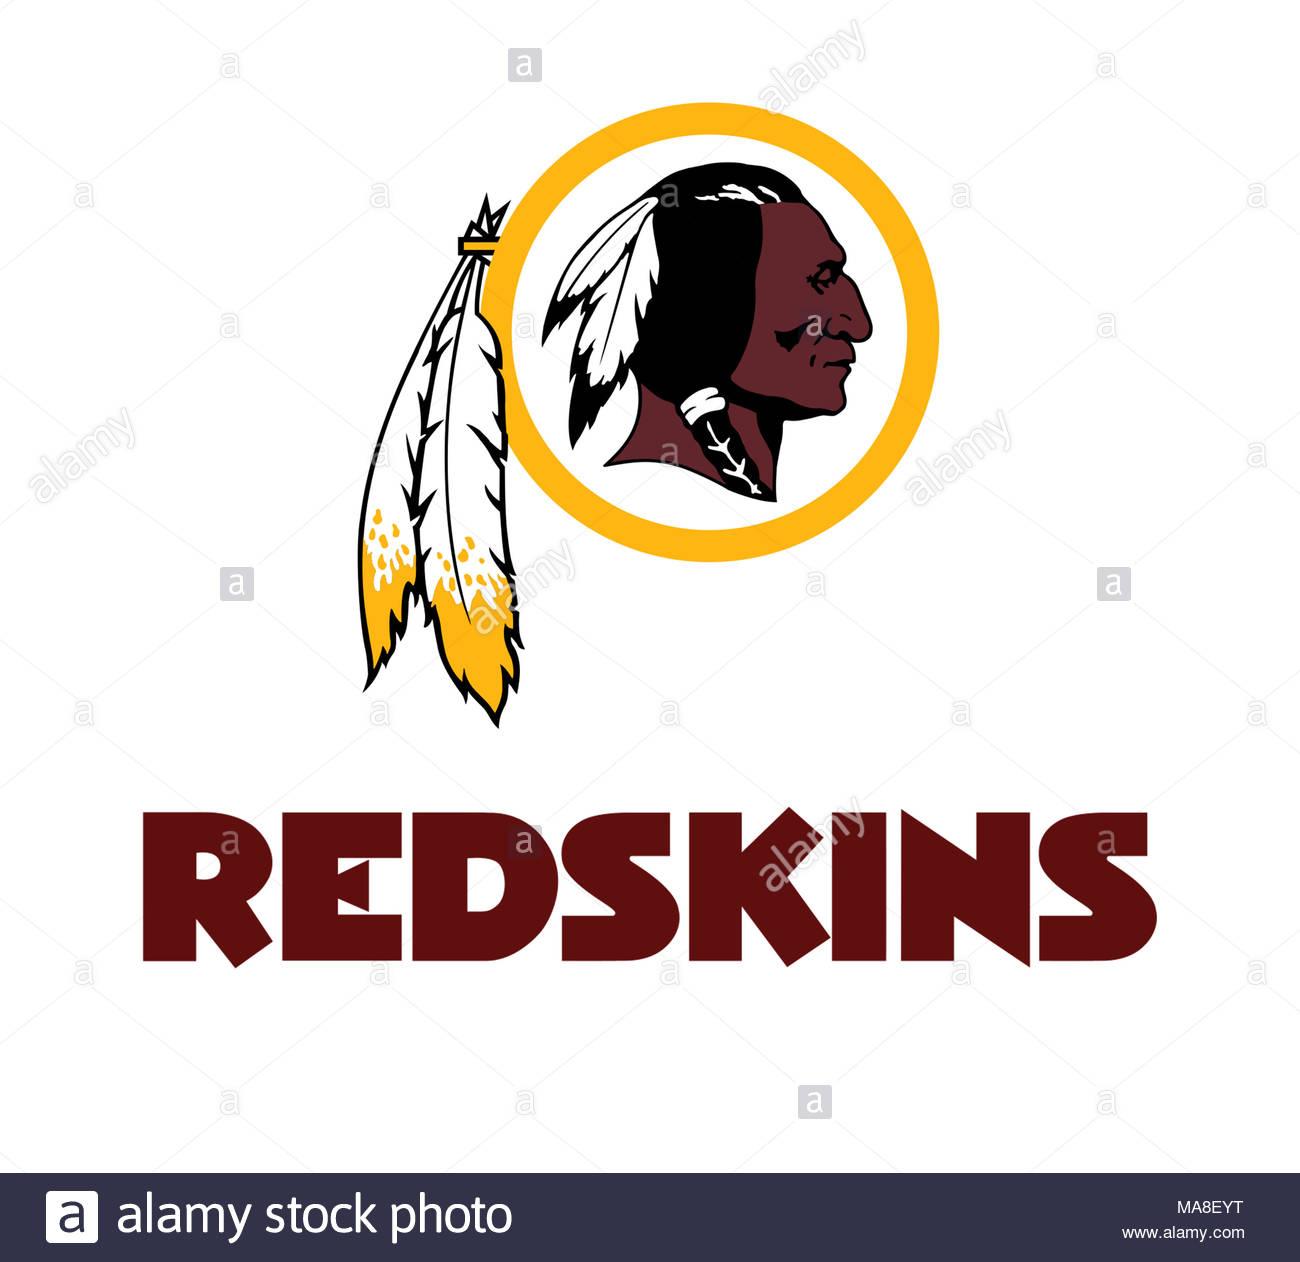 be811af52a9 Washington Redskins logo icon Stock Photo  178437612 - Alamy